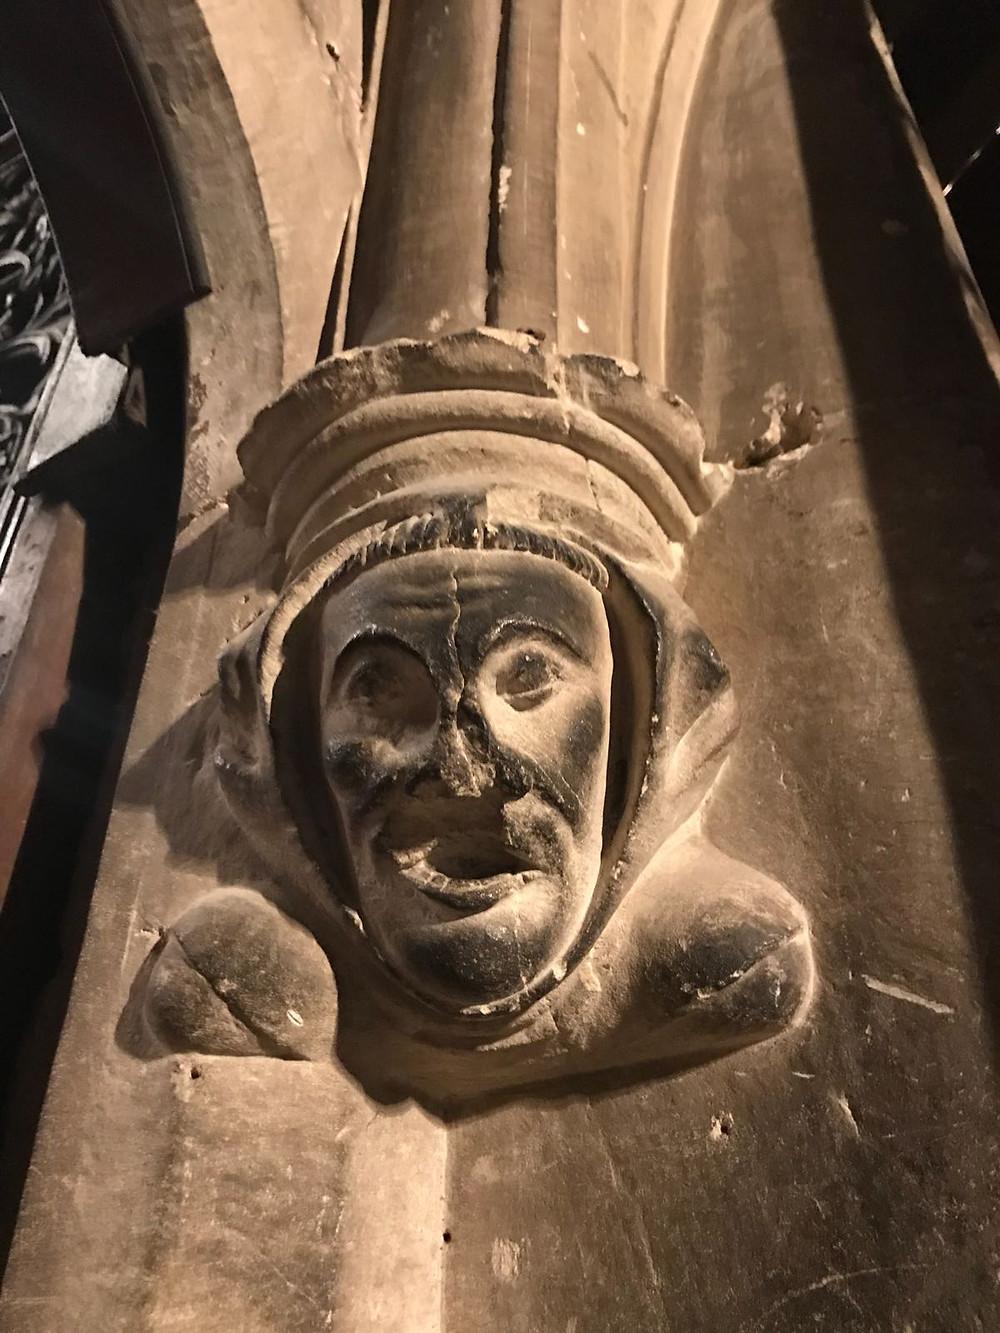 Un ejemplo de la llamada escultura marginal típica del Gótico